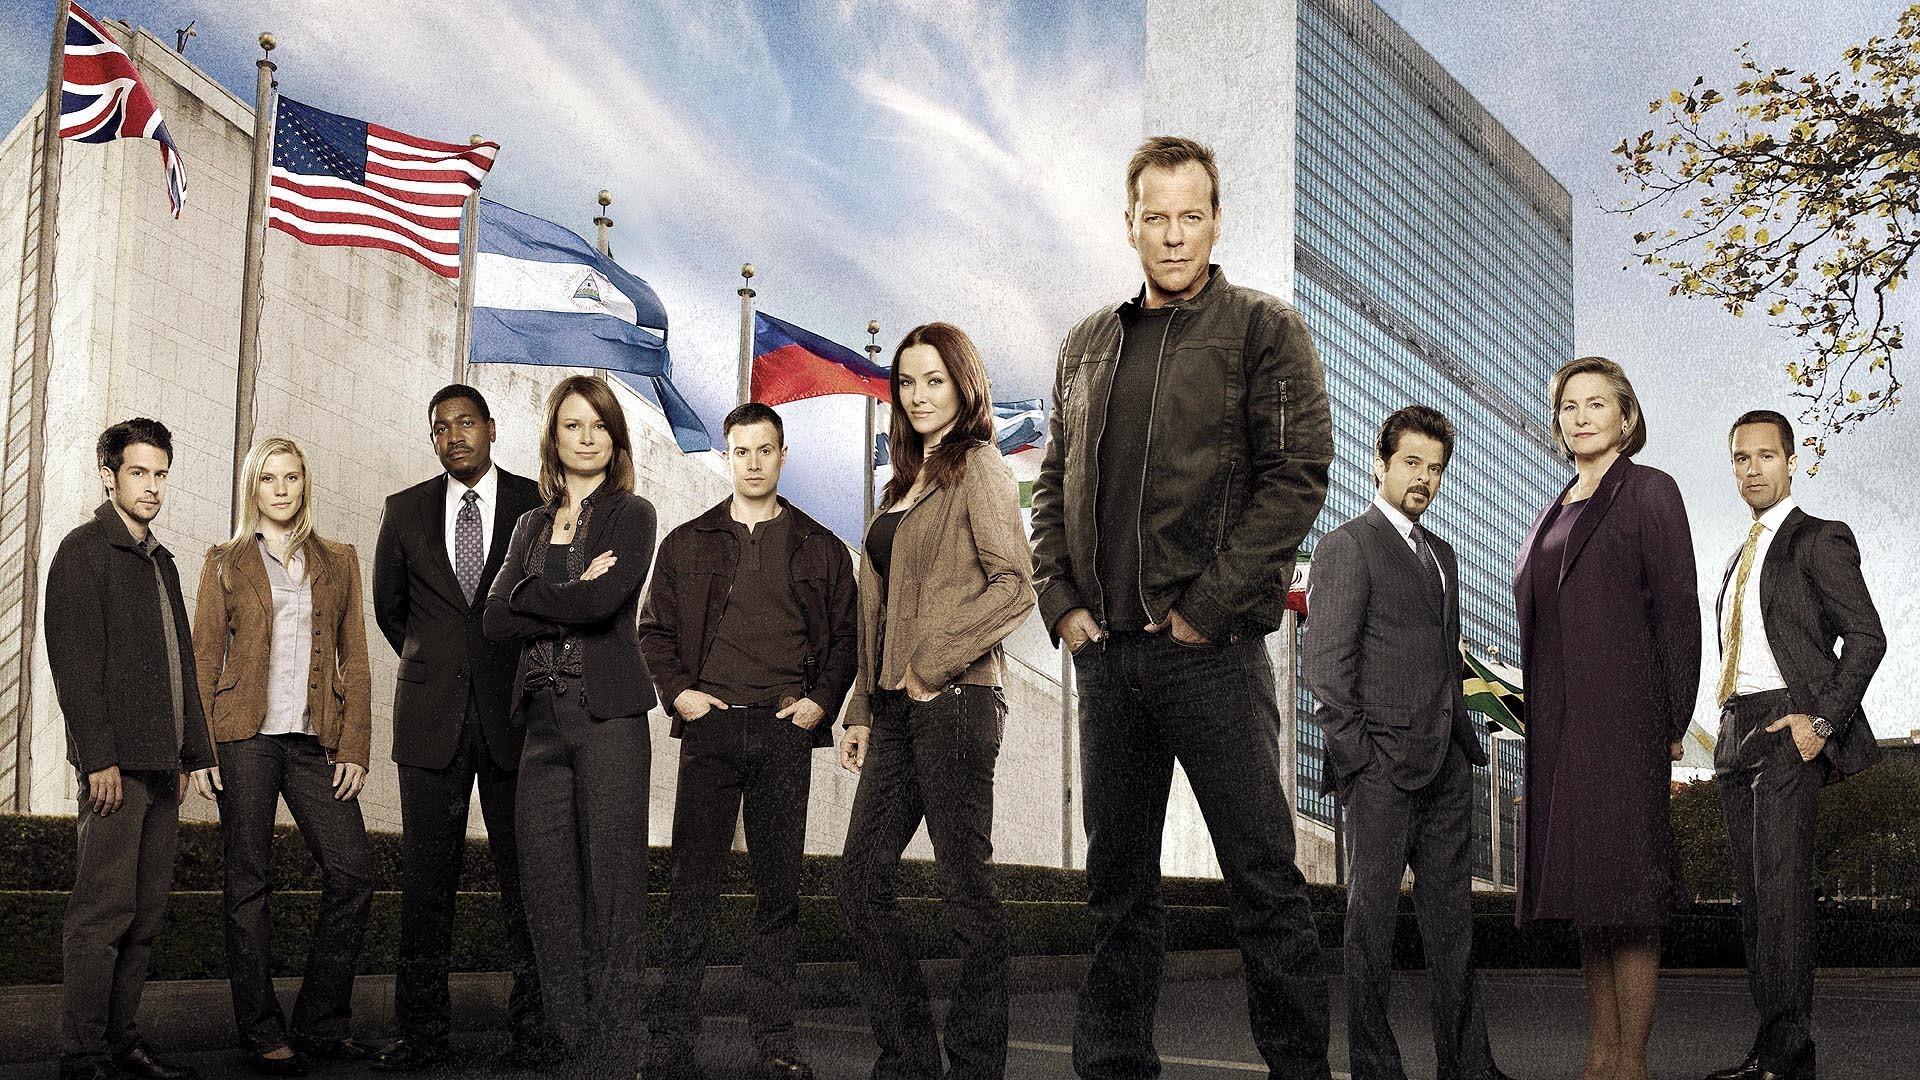 tv movies police american flag HD Wallpaper – Movies & TV (#986345)